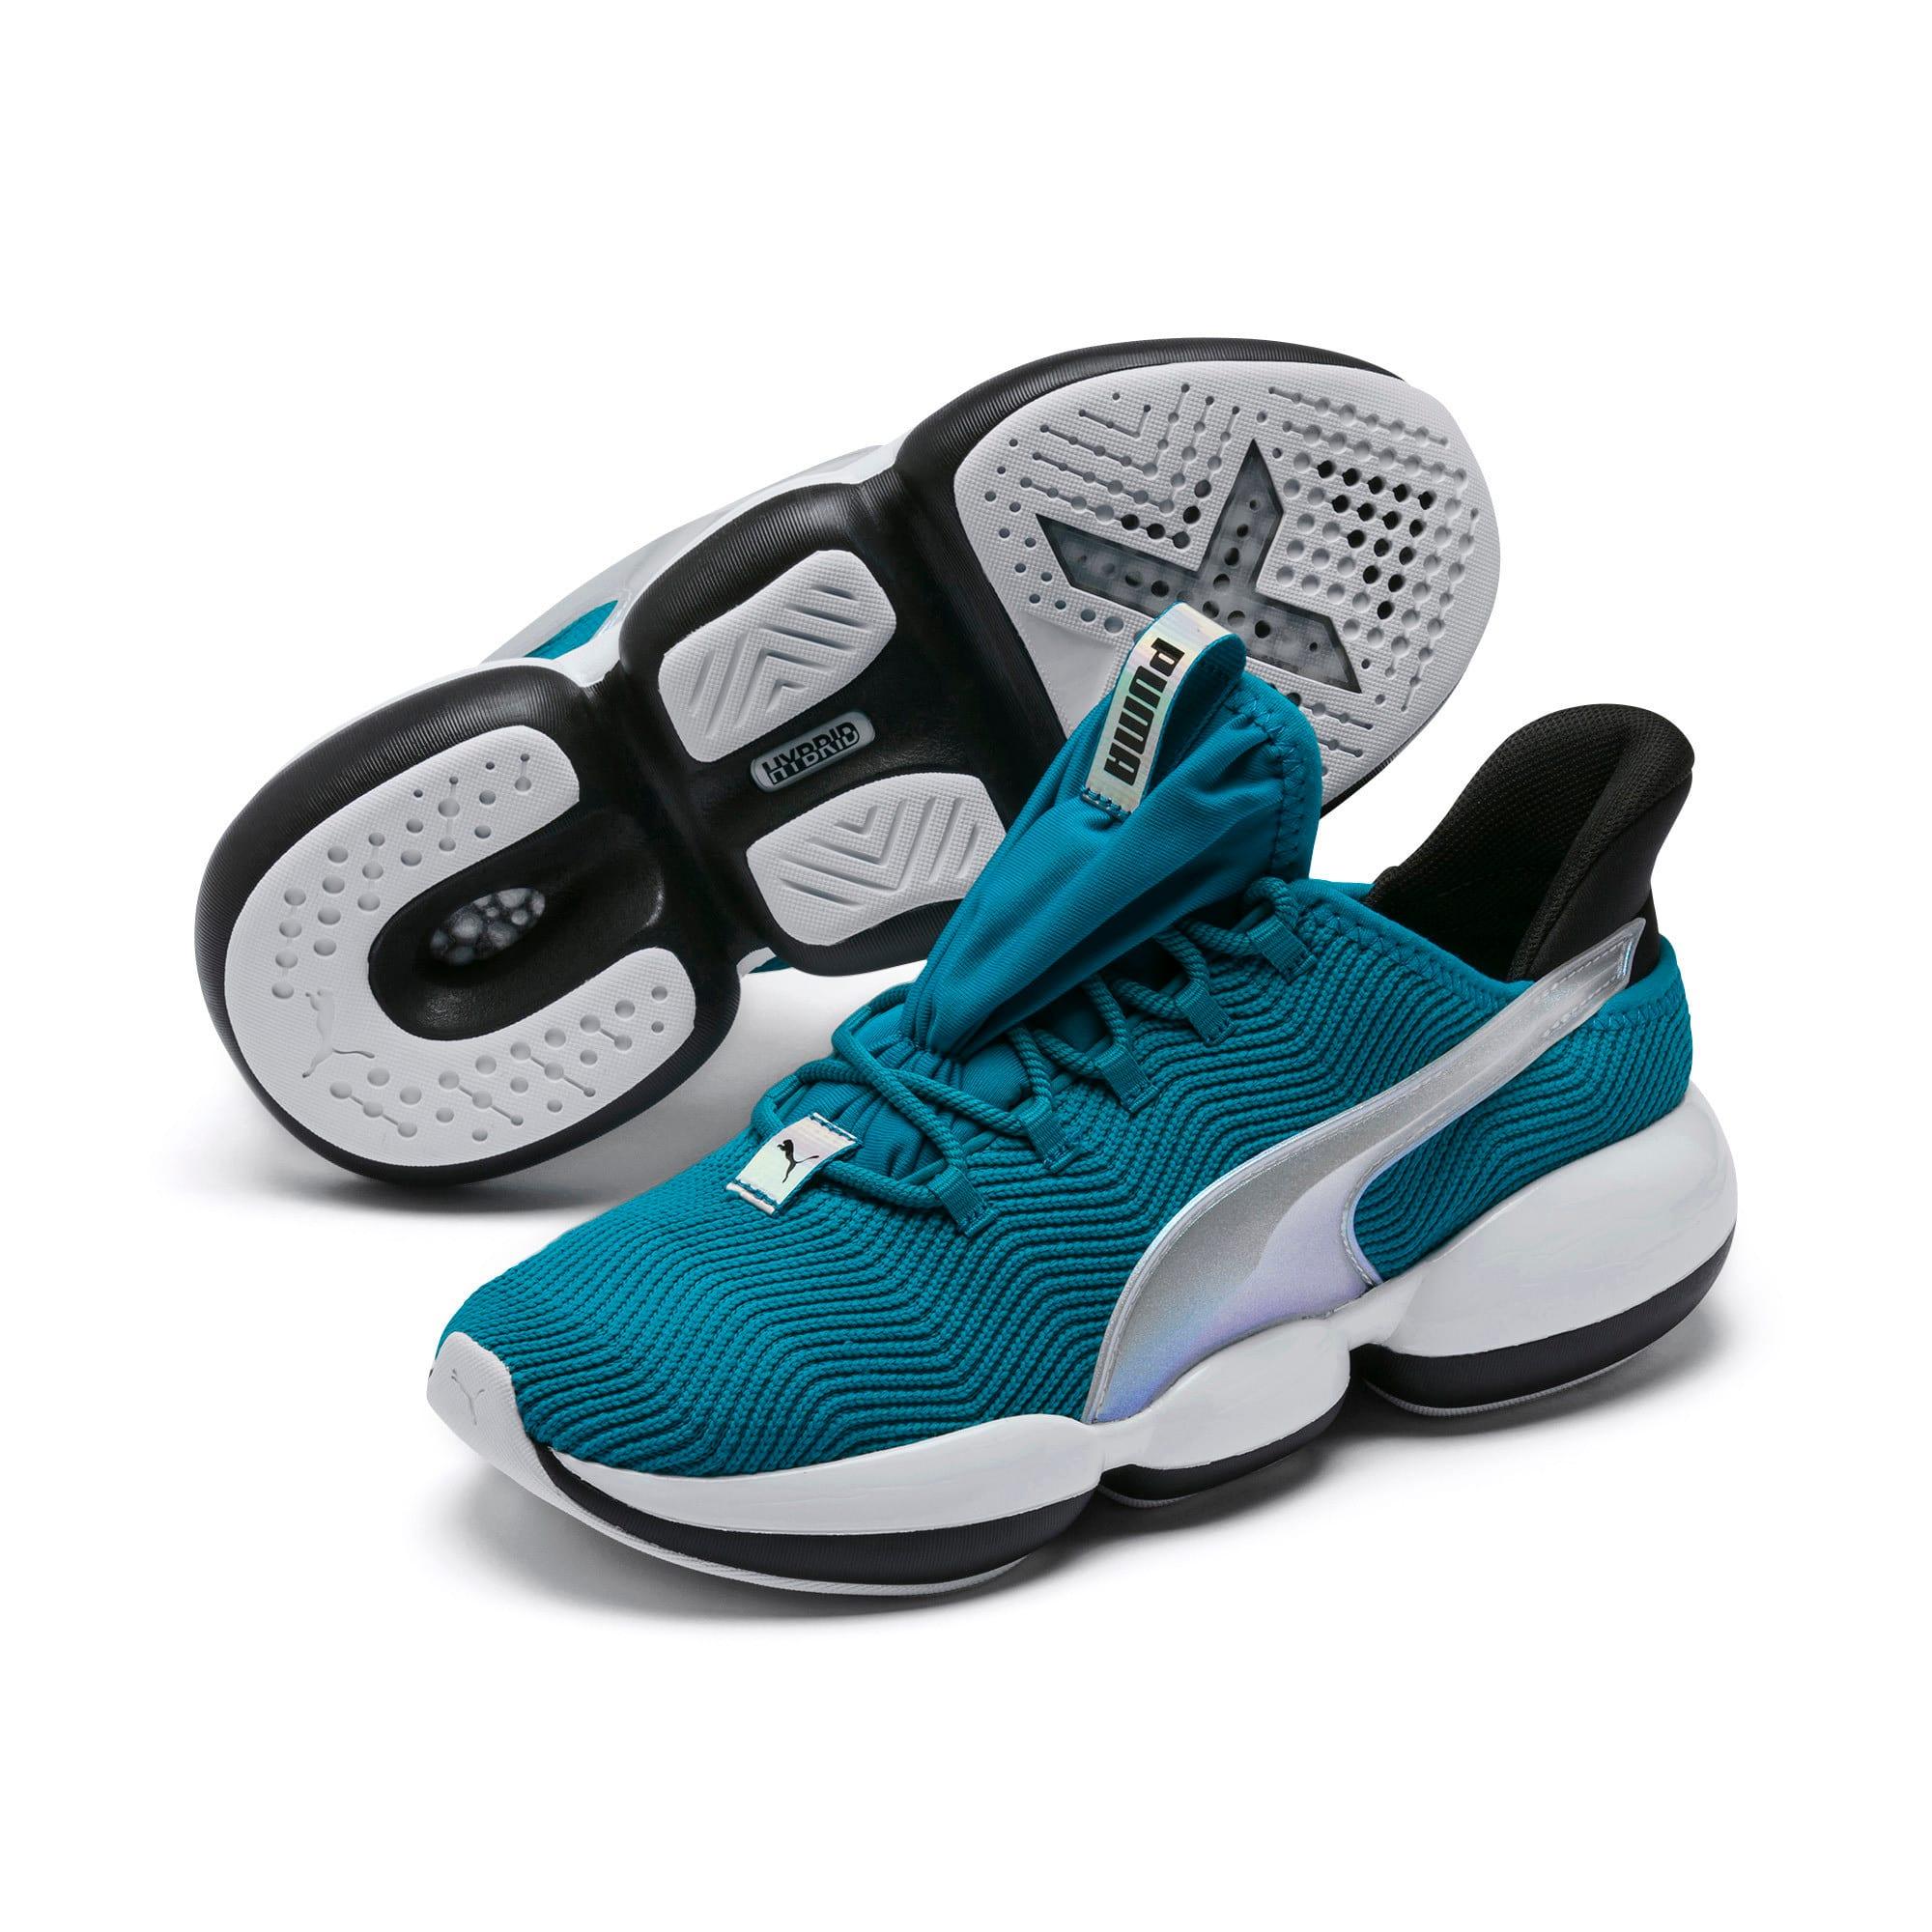 Imagen en miniatura 3 de Zapatillas de mujer Mode XT Iridescent Trailblazer, Caribbean Sea-Puma White, mediana